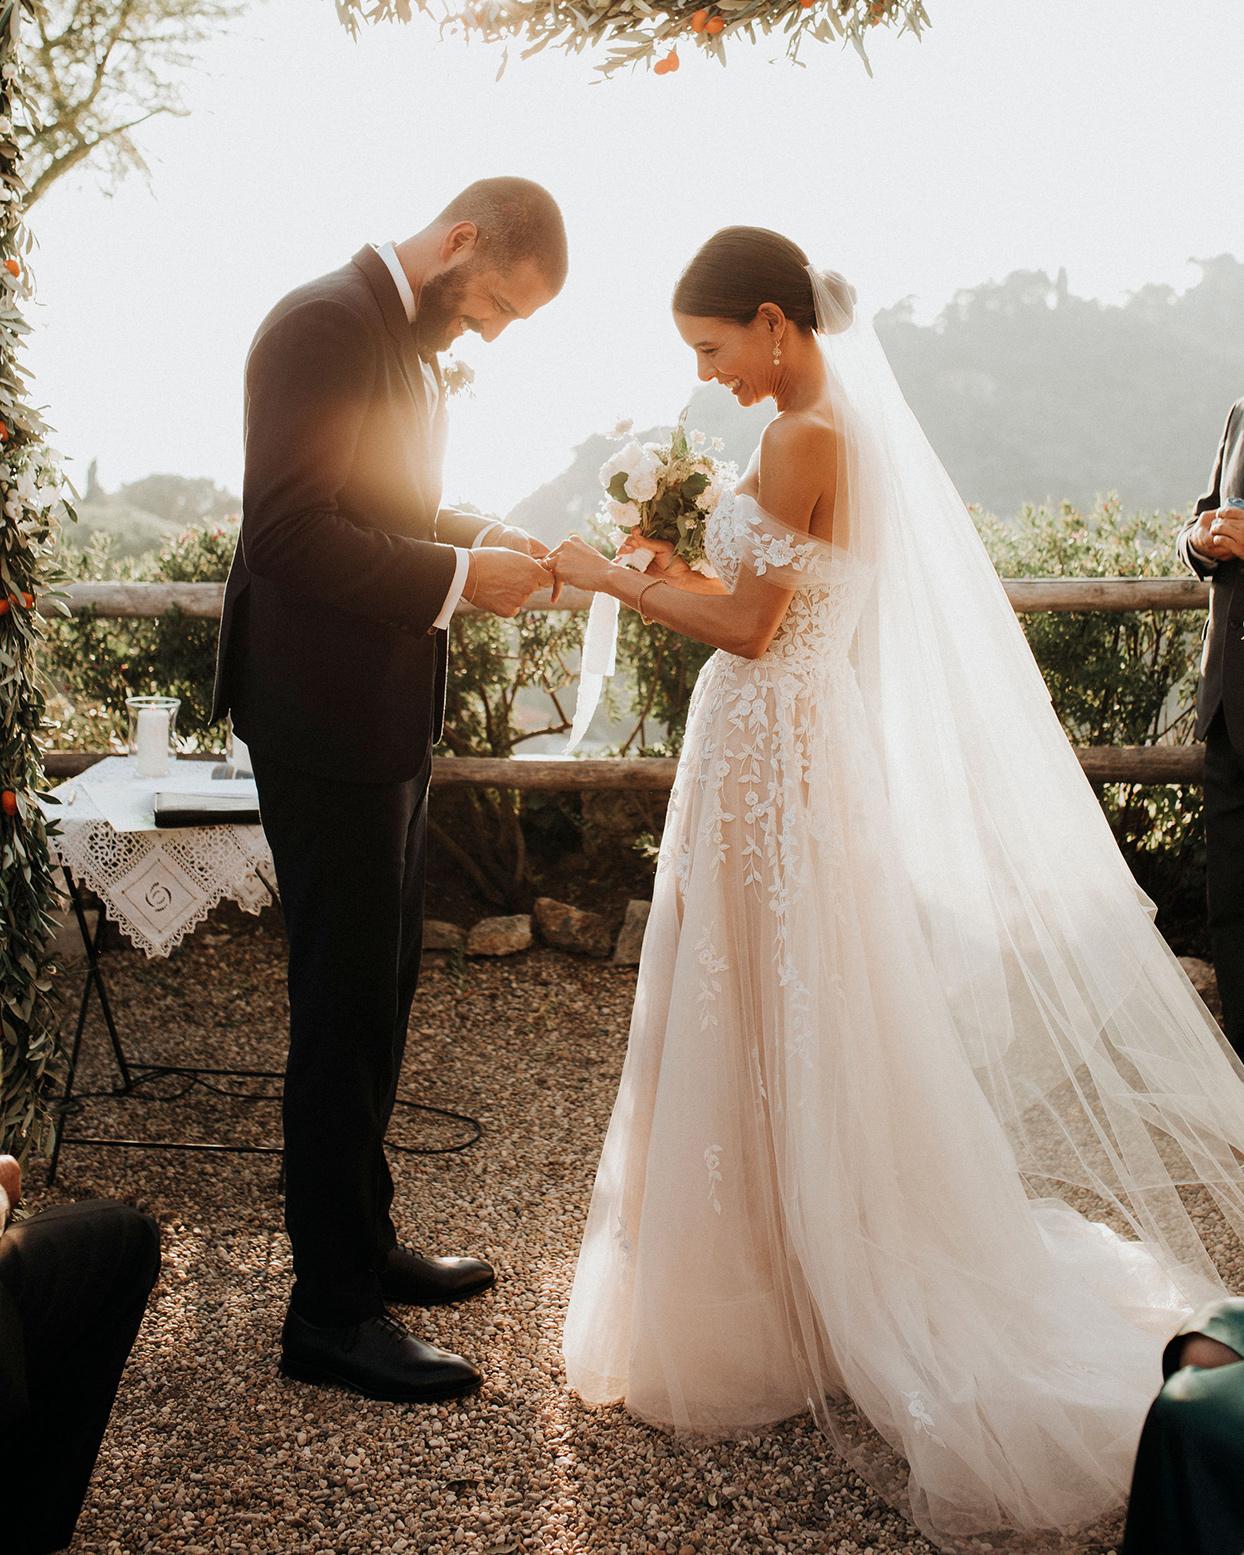 jaclyn antonio wedding ceremony ring exchange